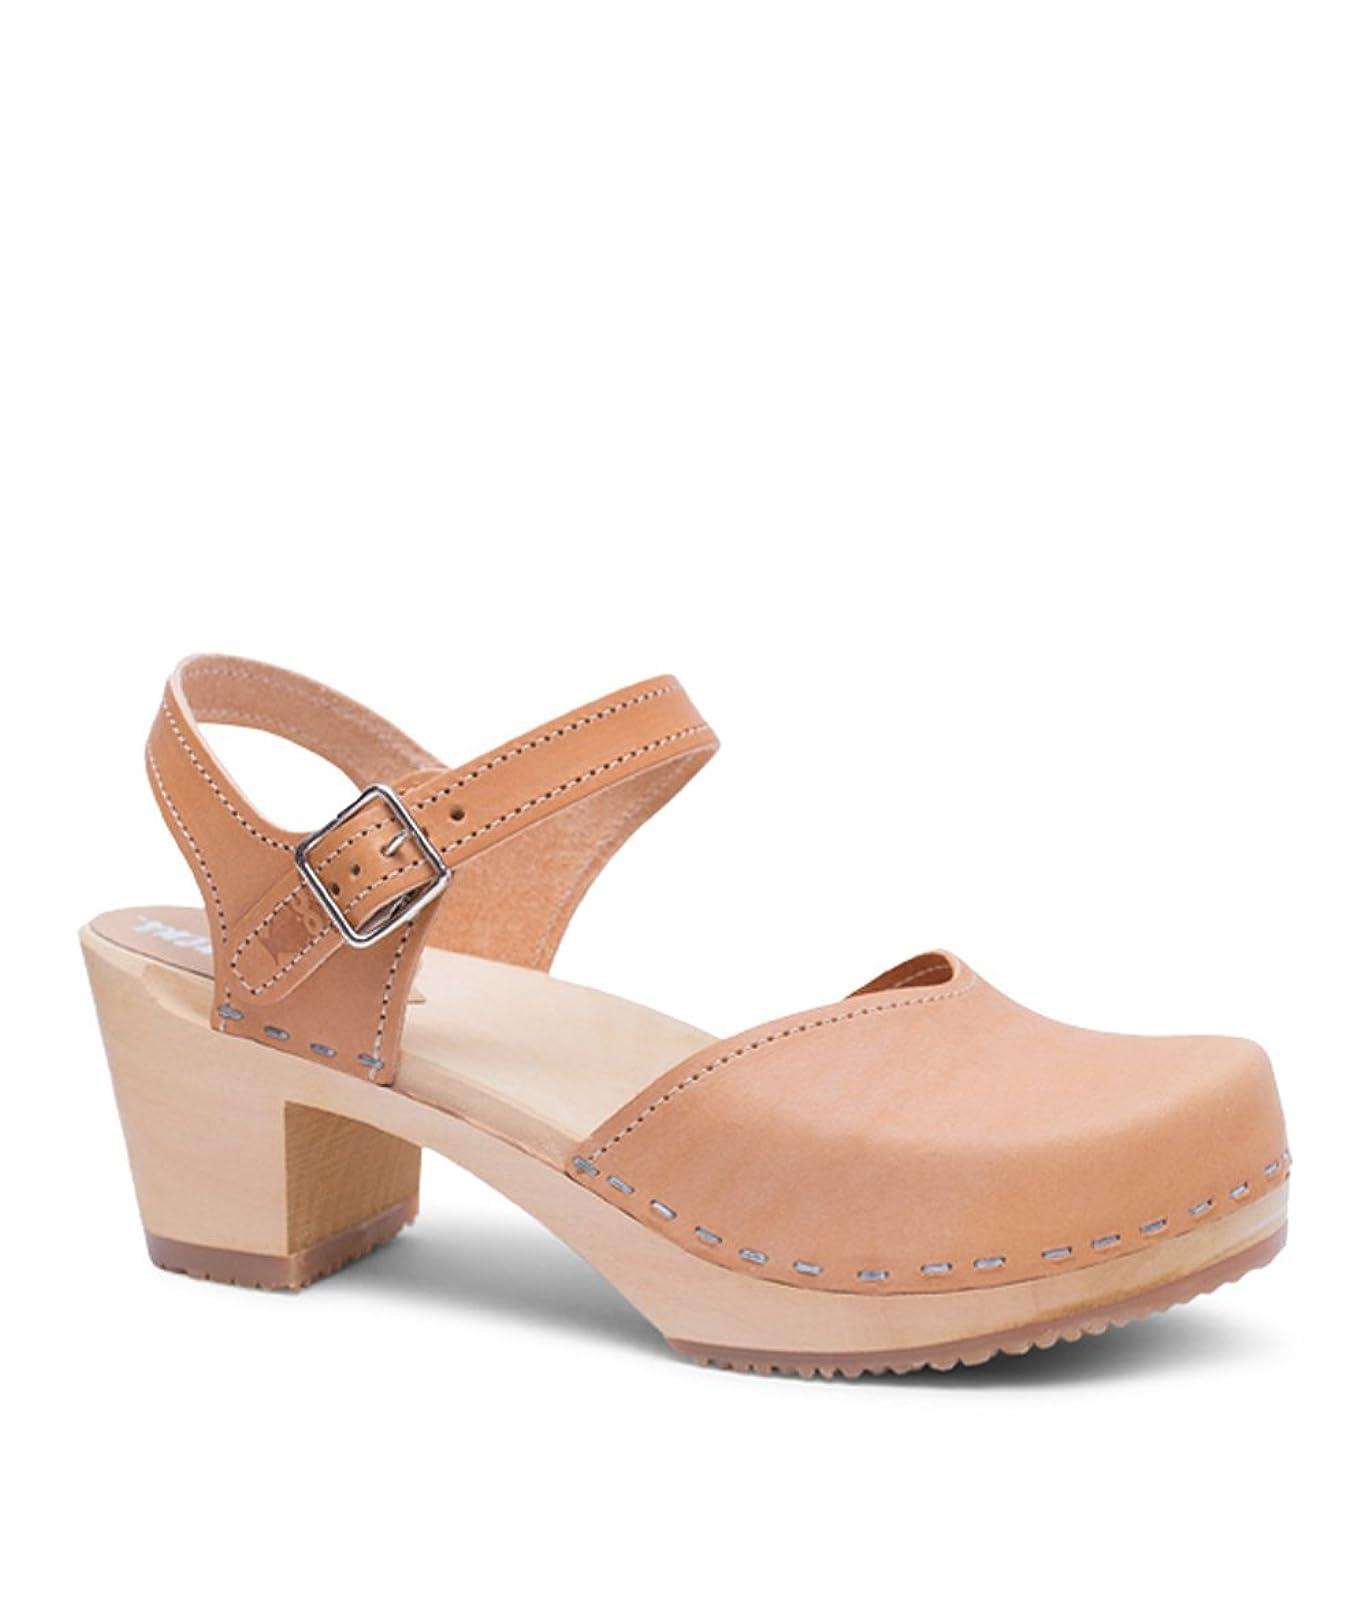 Sandgrens Swedish Wooden High Heel Clog Sandals - 7